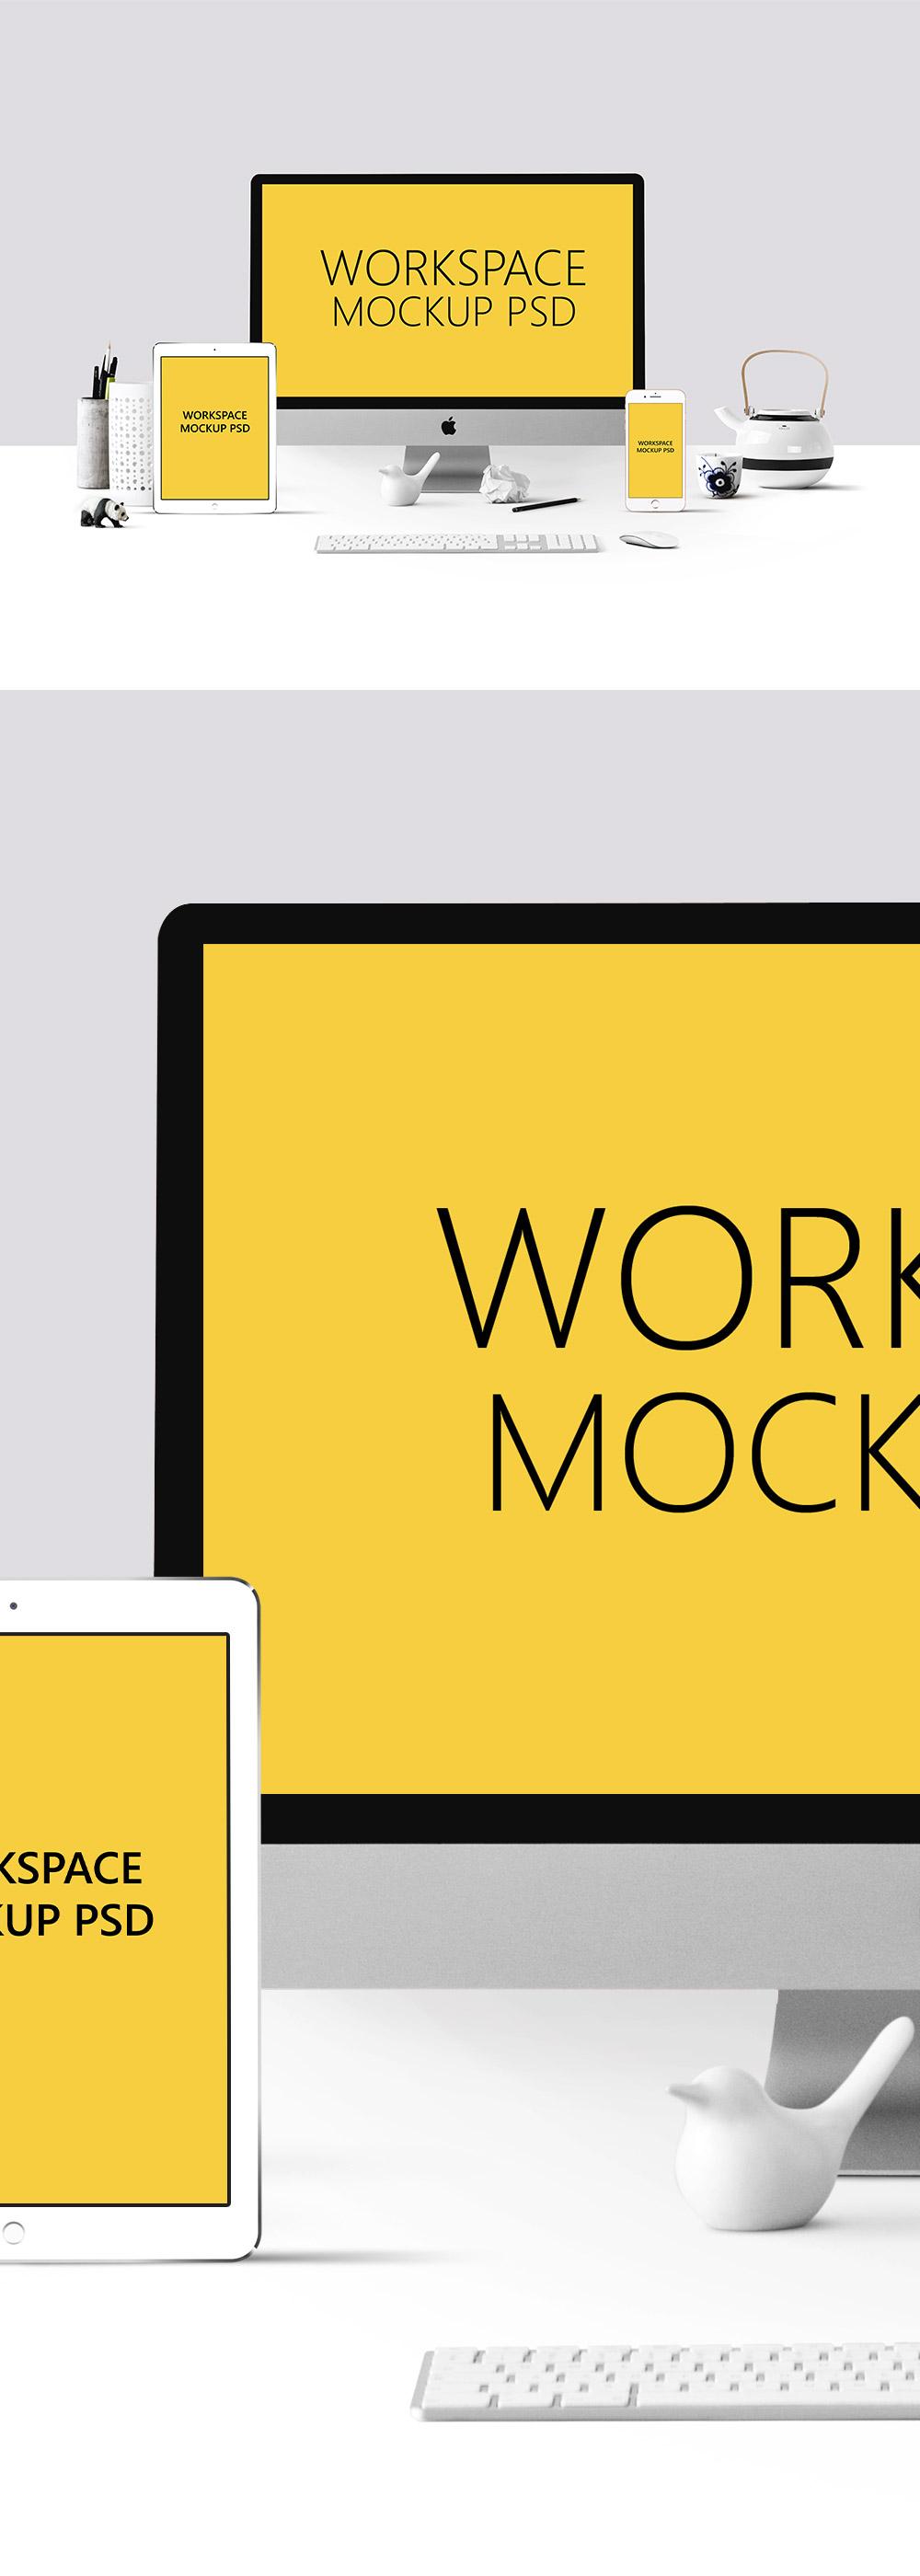 Free Workspace Mockup PSD